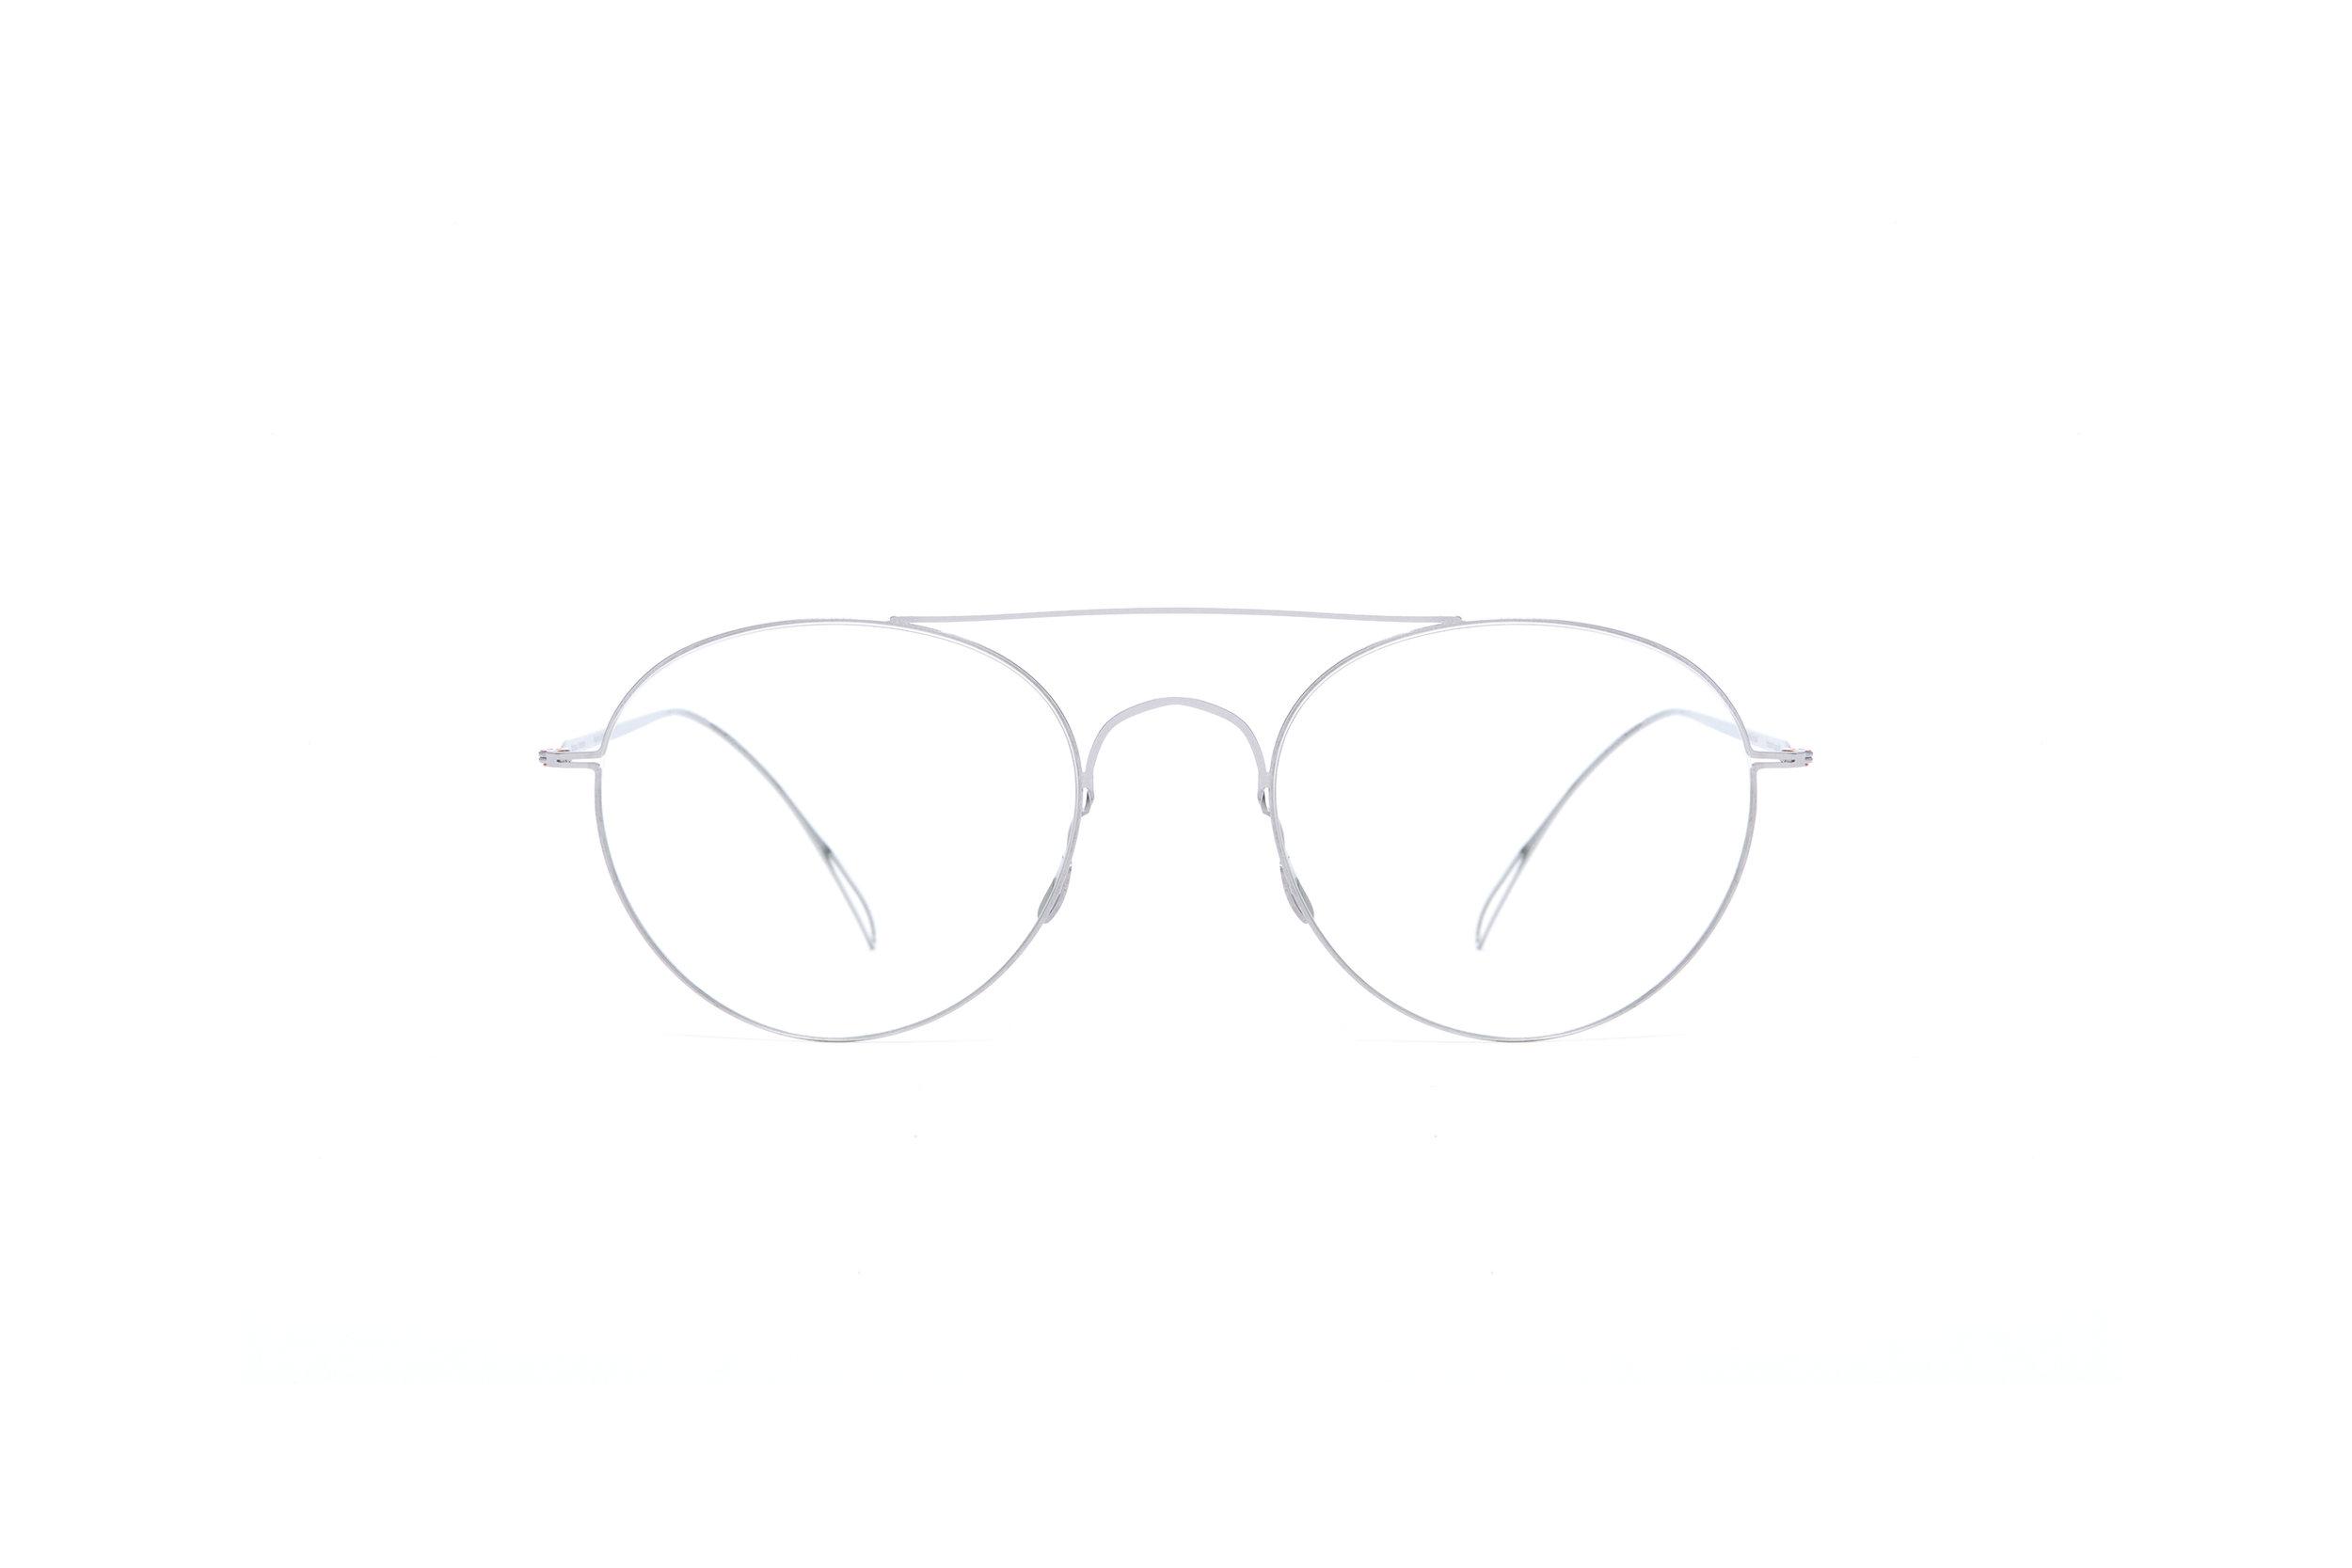 haffmans_neumeister_fawcett_silver_clear_ultralight_eyeglasses_front_102458.jpg